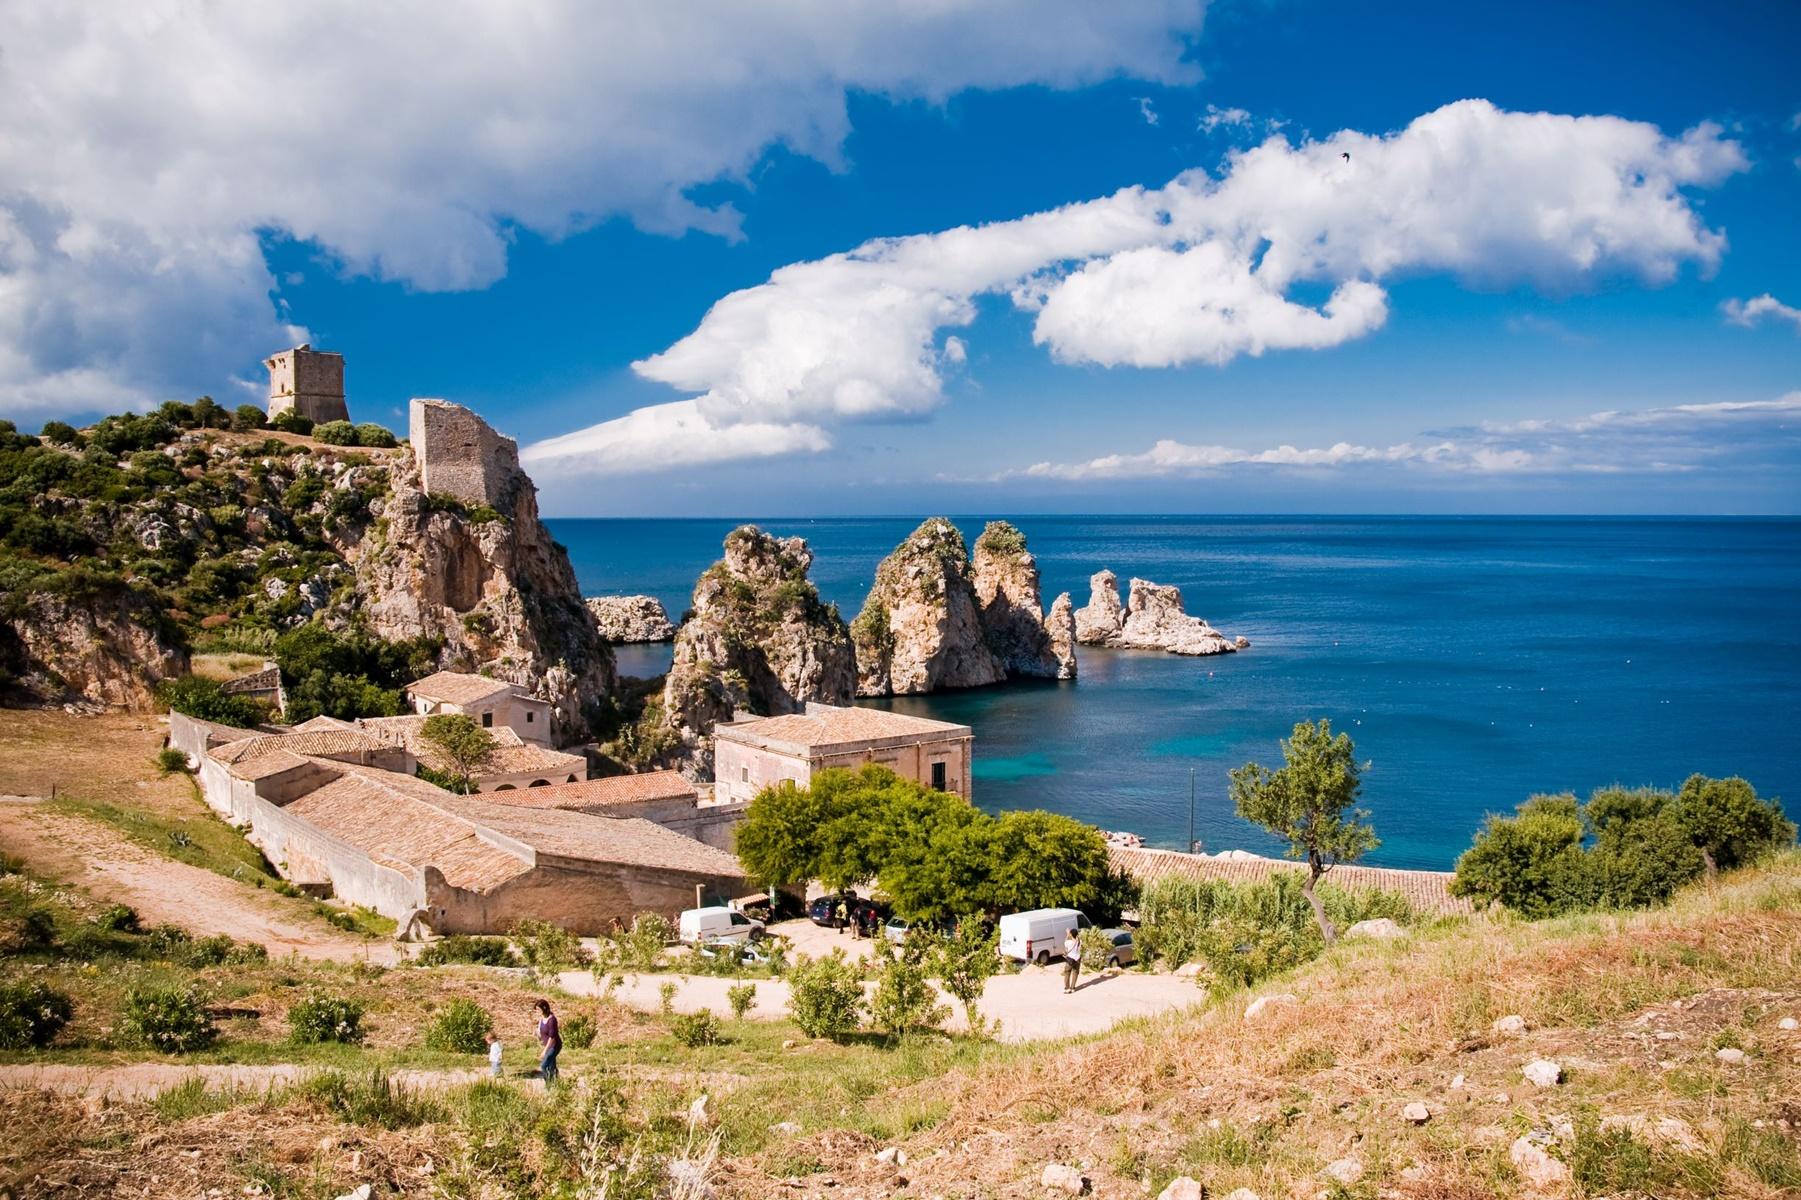 sicily area information discover scopello holiday villa seaside coastline houses rocks